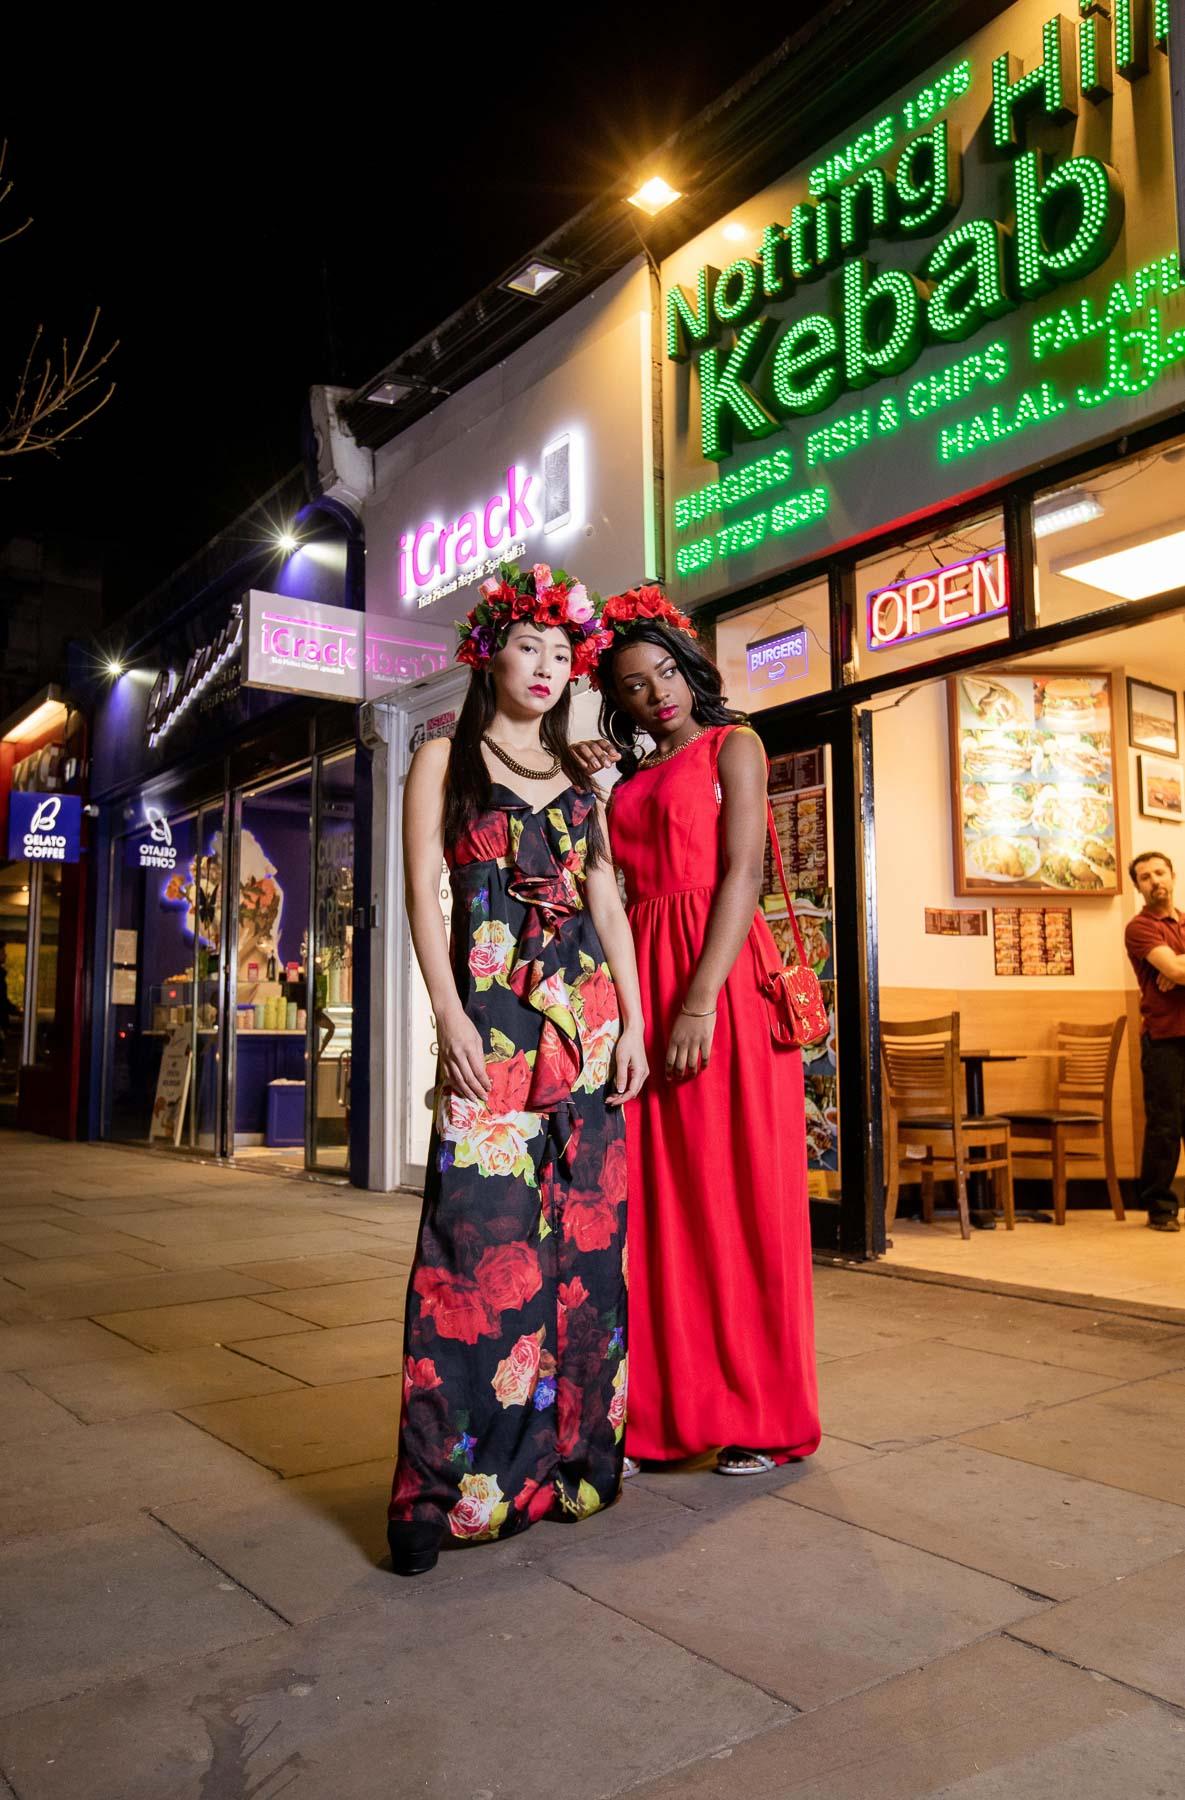 Russian-style-fashion-photographer-london-floral-Русский-стиль-мода-павловопосадский-платок-natalia-smith-photography-0023.jpg